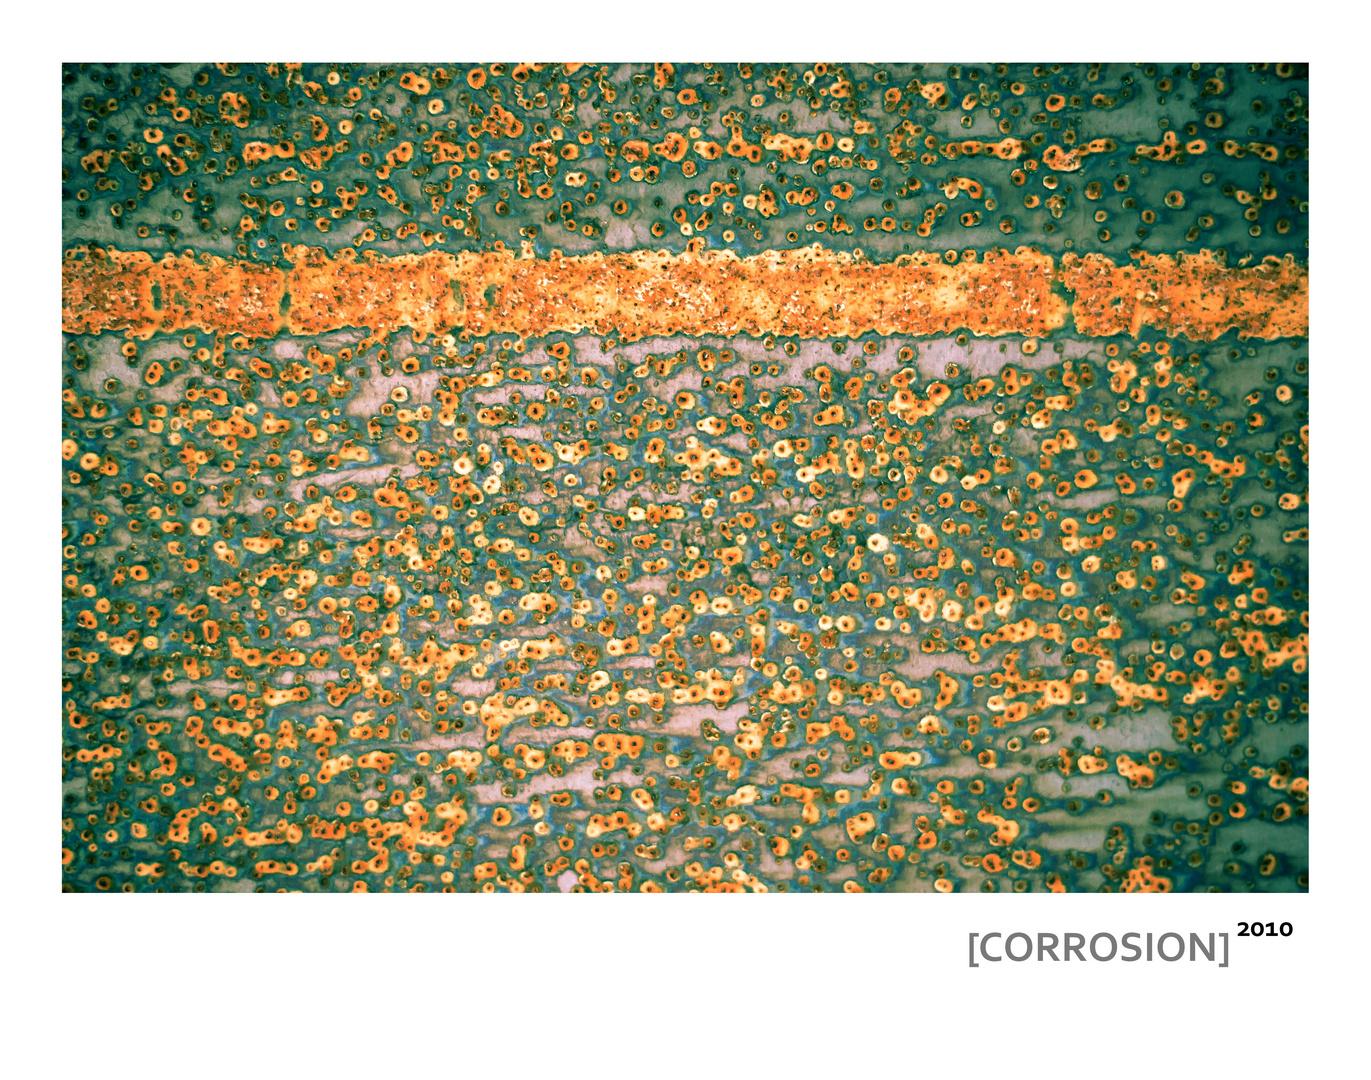 This Corrosion